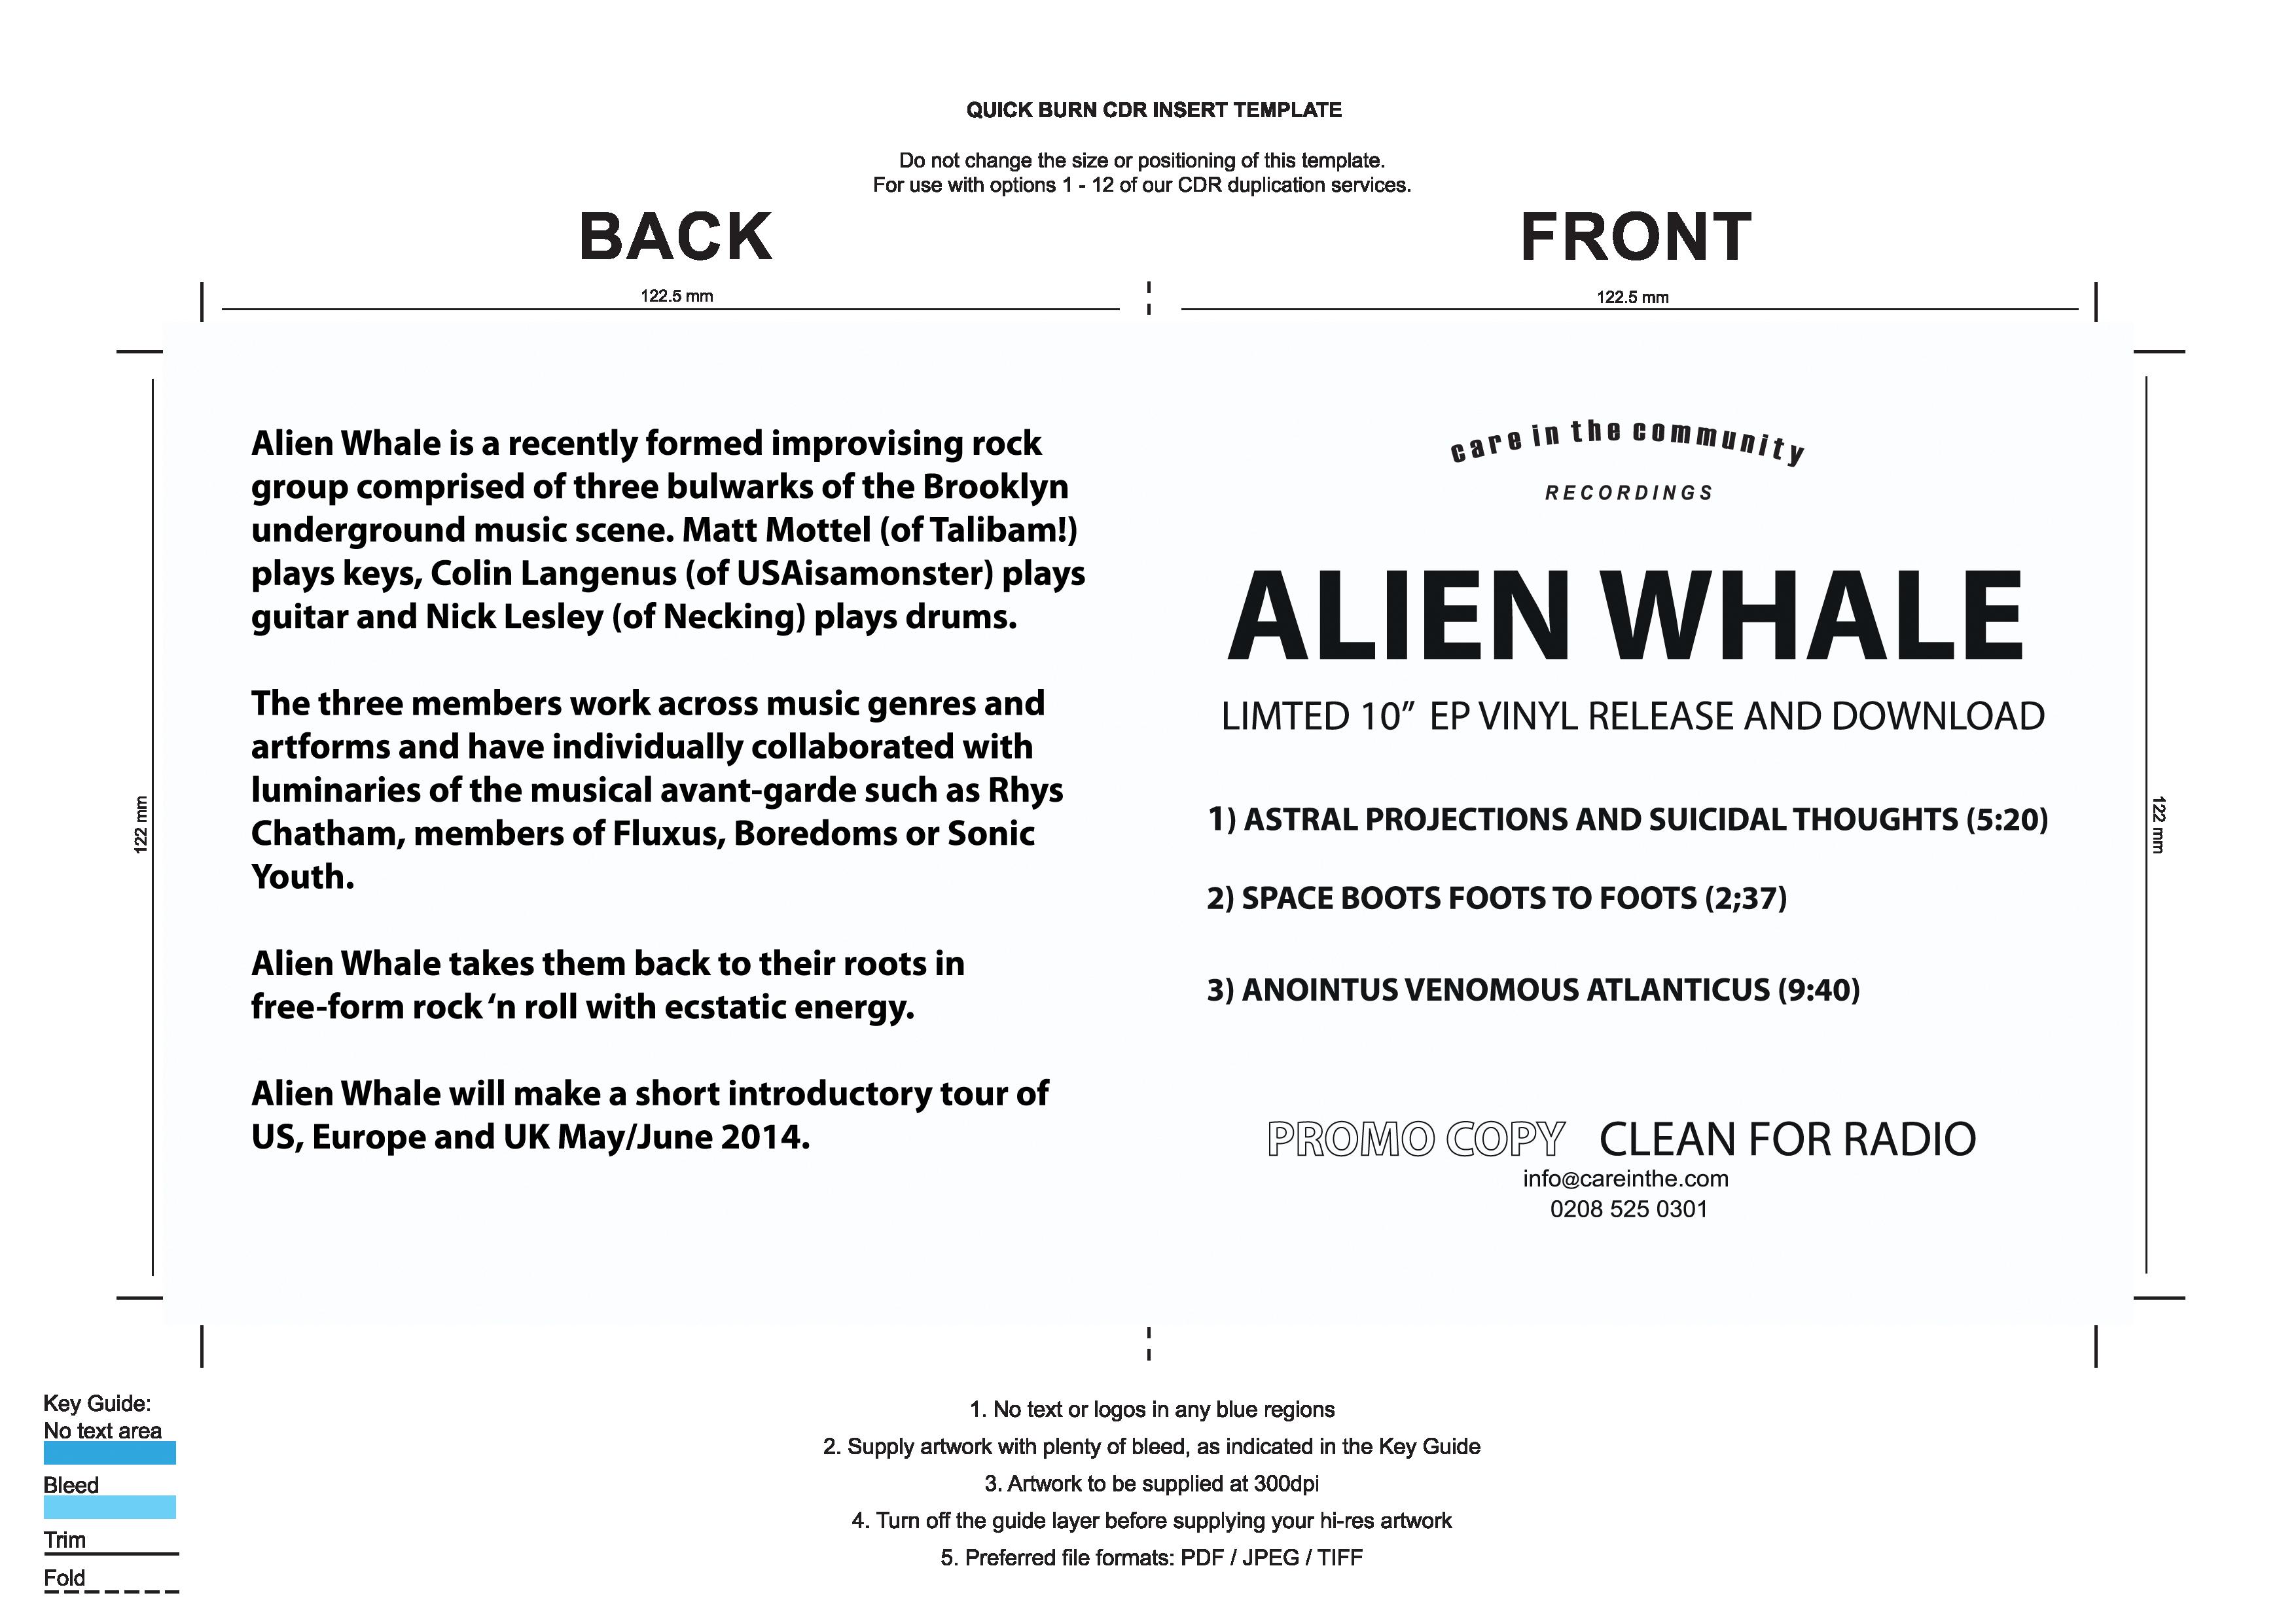 Artwork Requirements Quickburn – Artwork Release Form